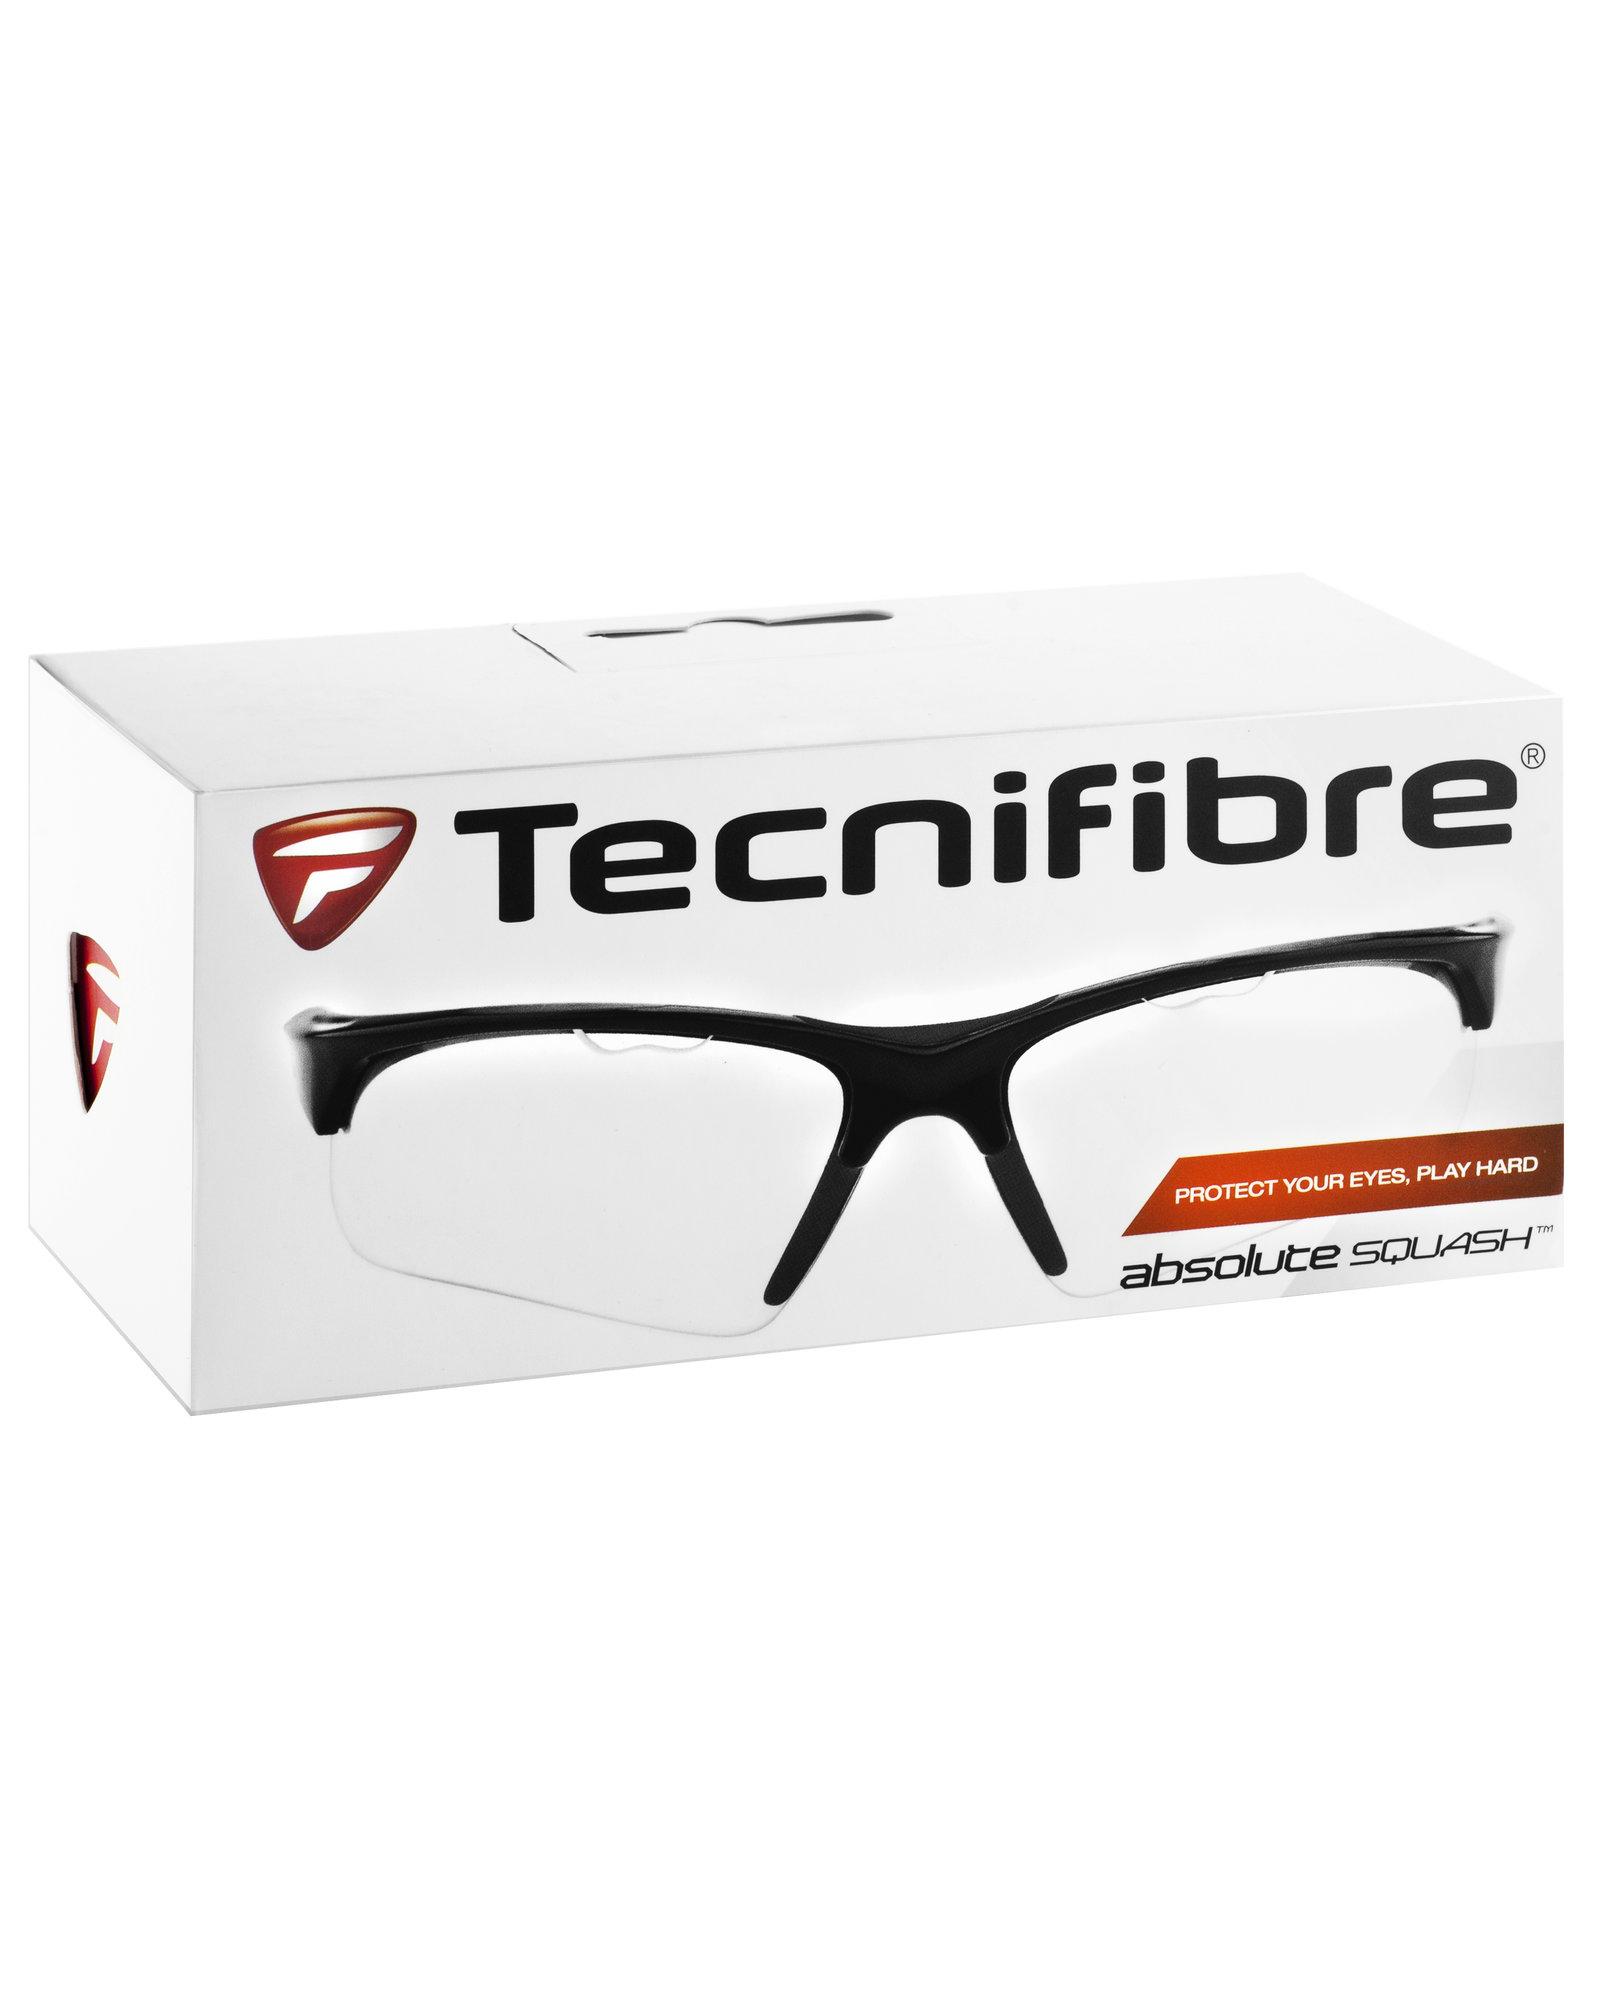 73a0f37a67 Tecnifibre Squash Eyewear